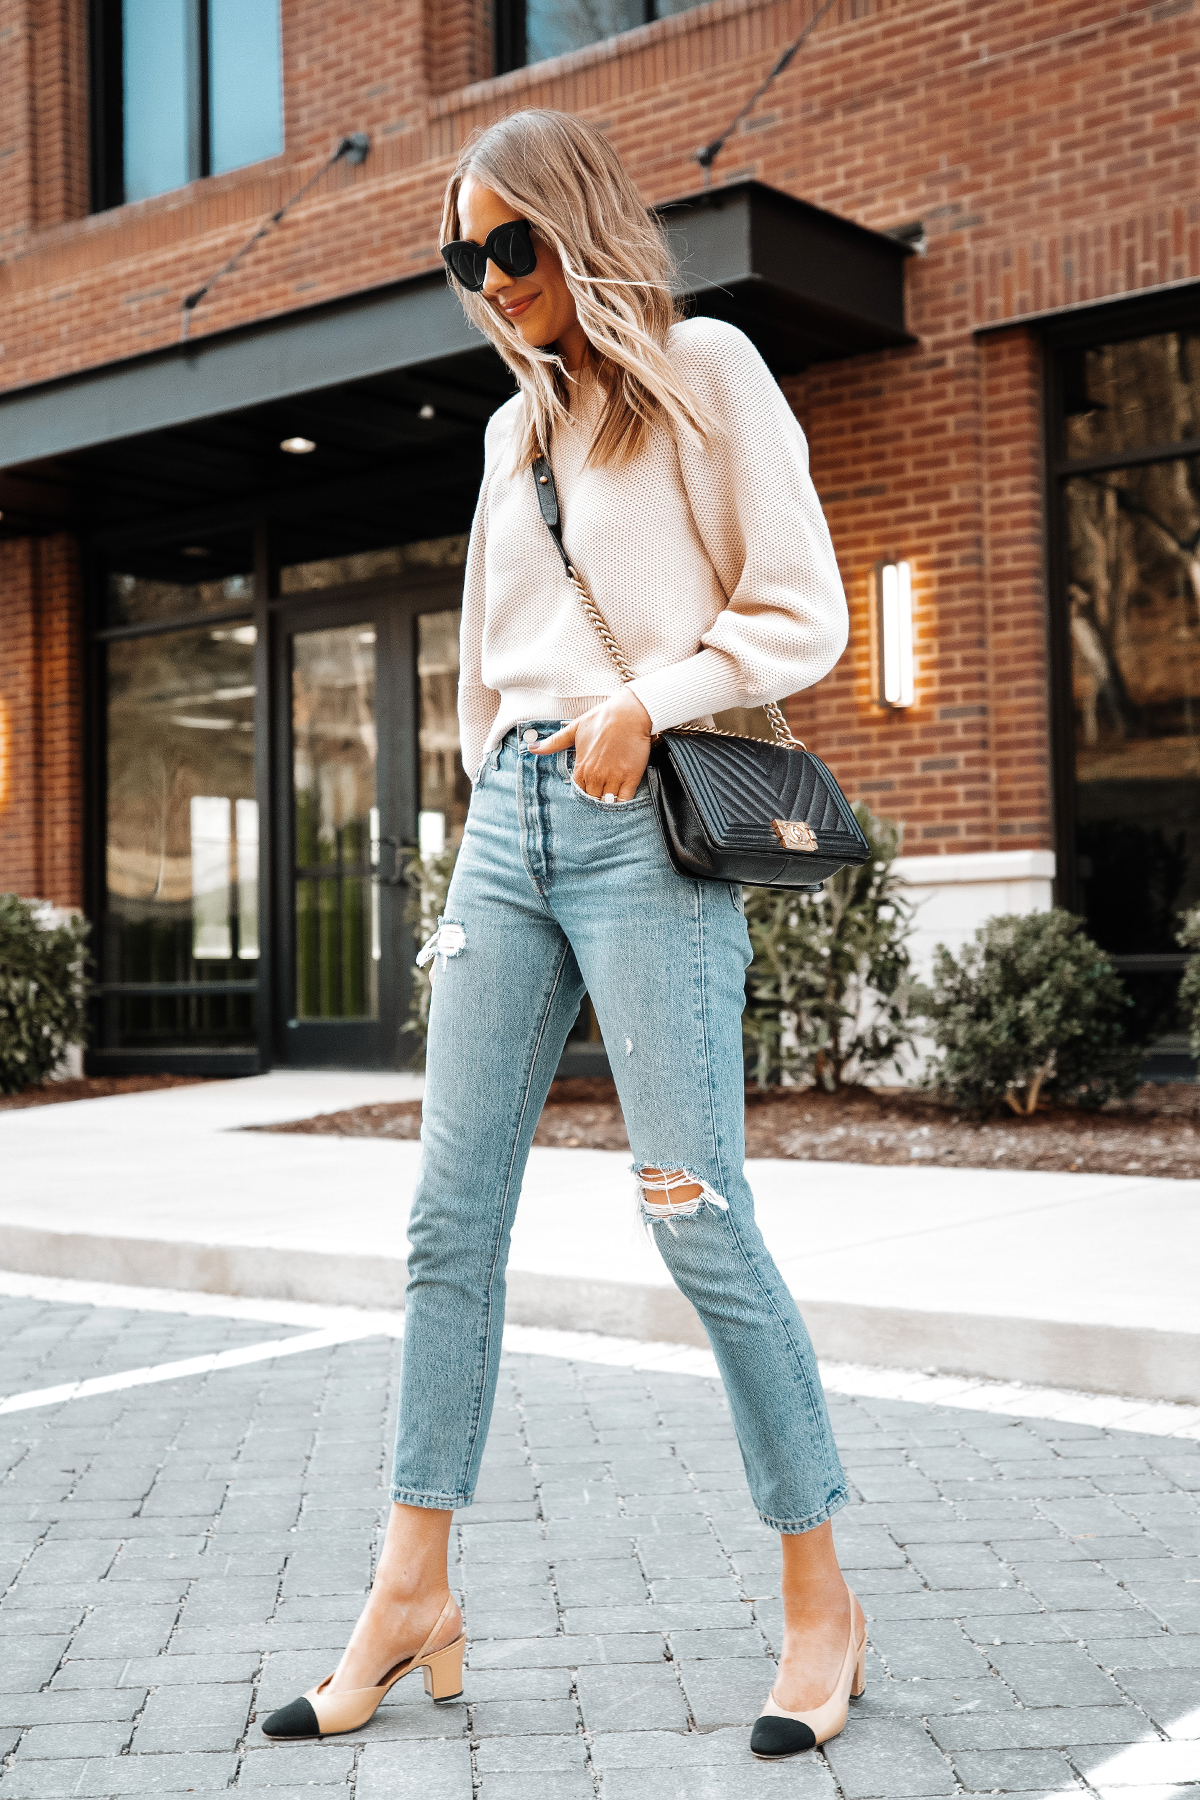 Fashion Jackson Wearing Ann Taylor Beige Knit Sweater Levis Ripped Jeans Chanel Slingbacks Chanel Black Boy Bag 2